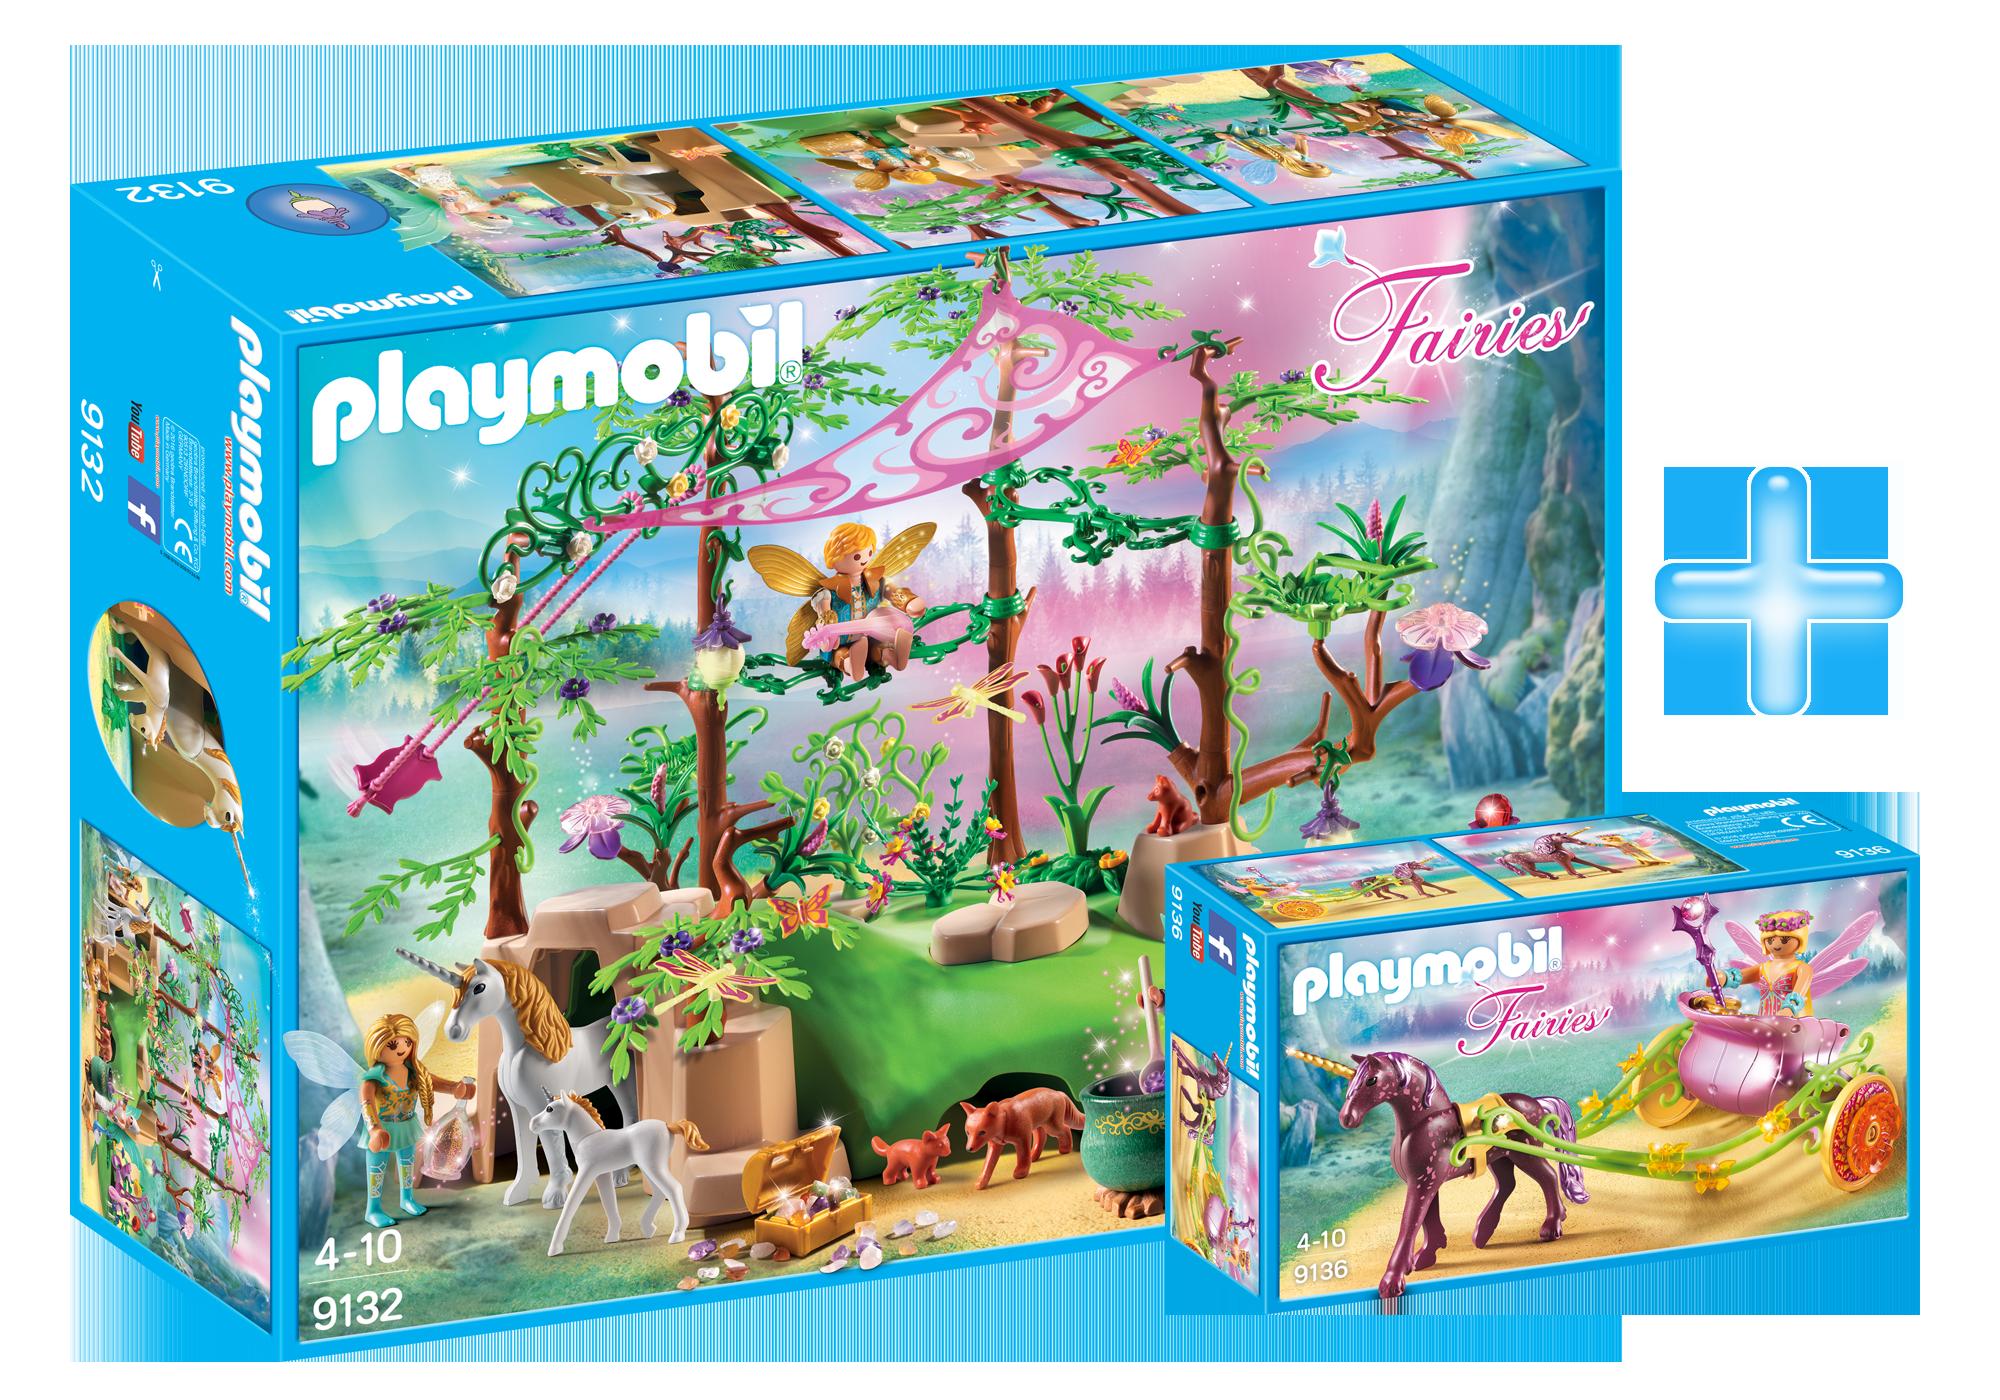 http://media.playmobil.com/i/playmobil/PM1905G_product_detail/Fairy Bundle